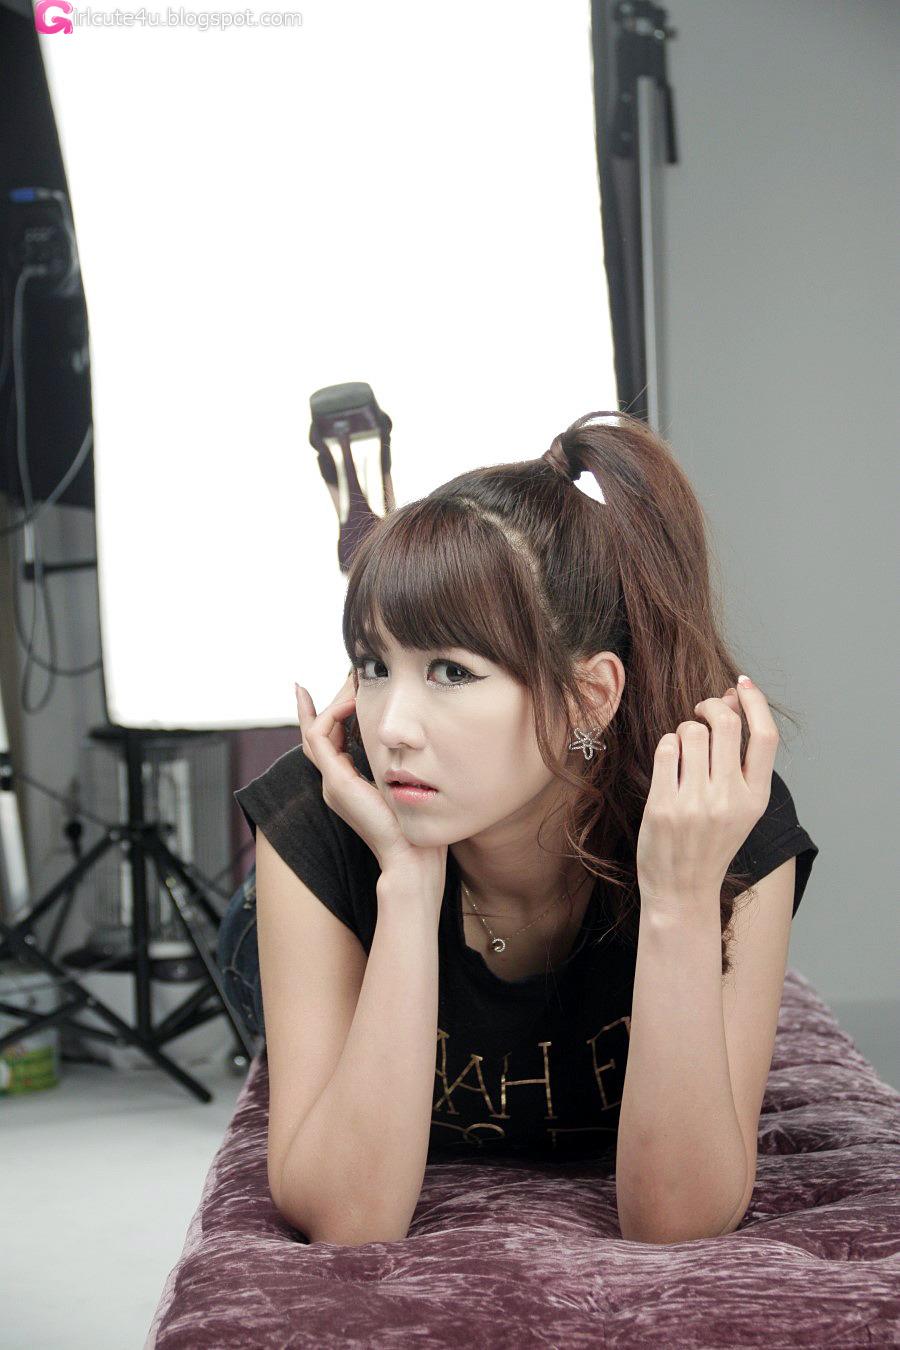 xxx nude girls: Lee Eun Hye - Teaser